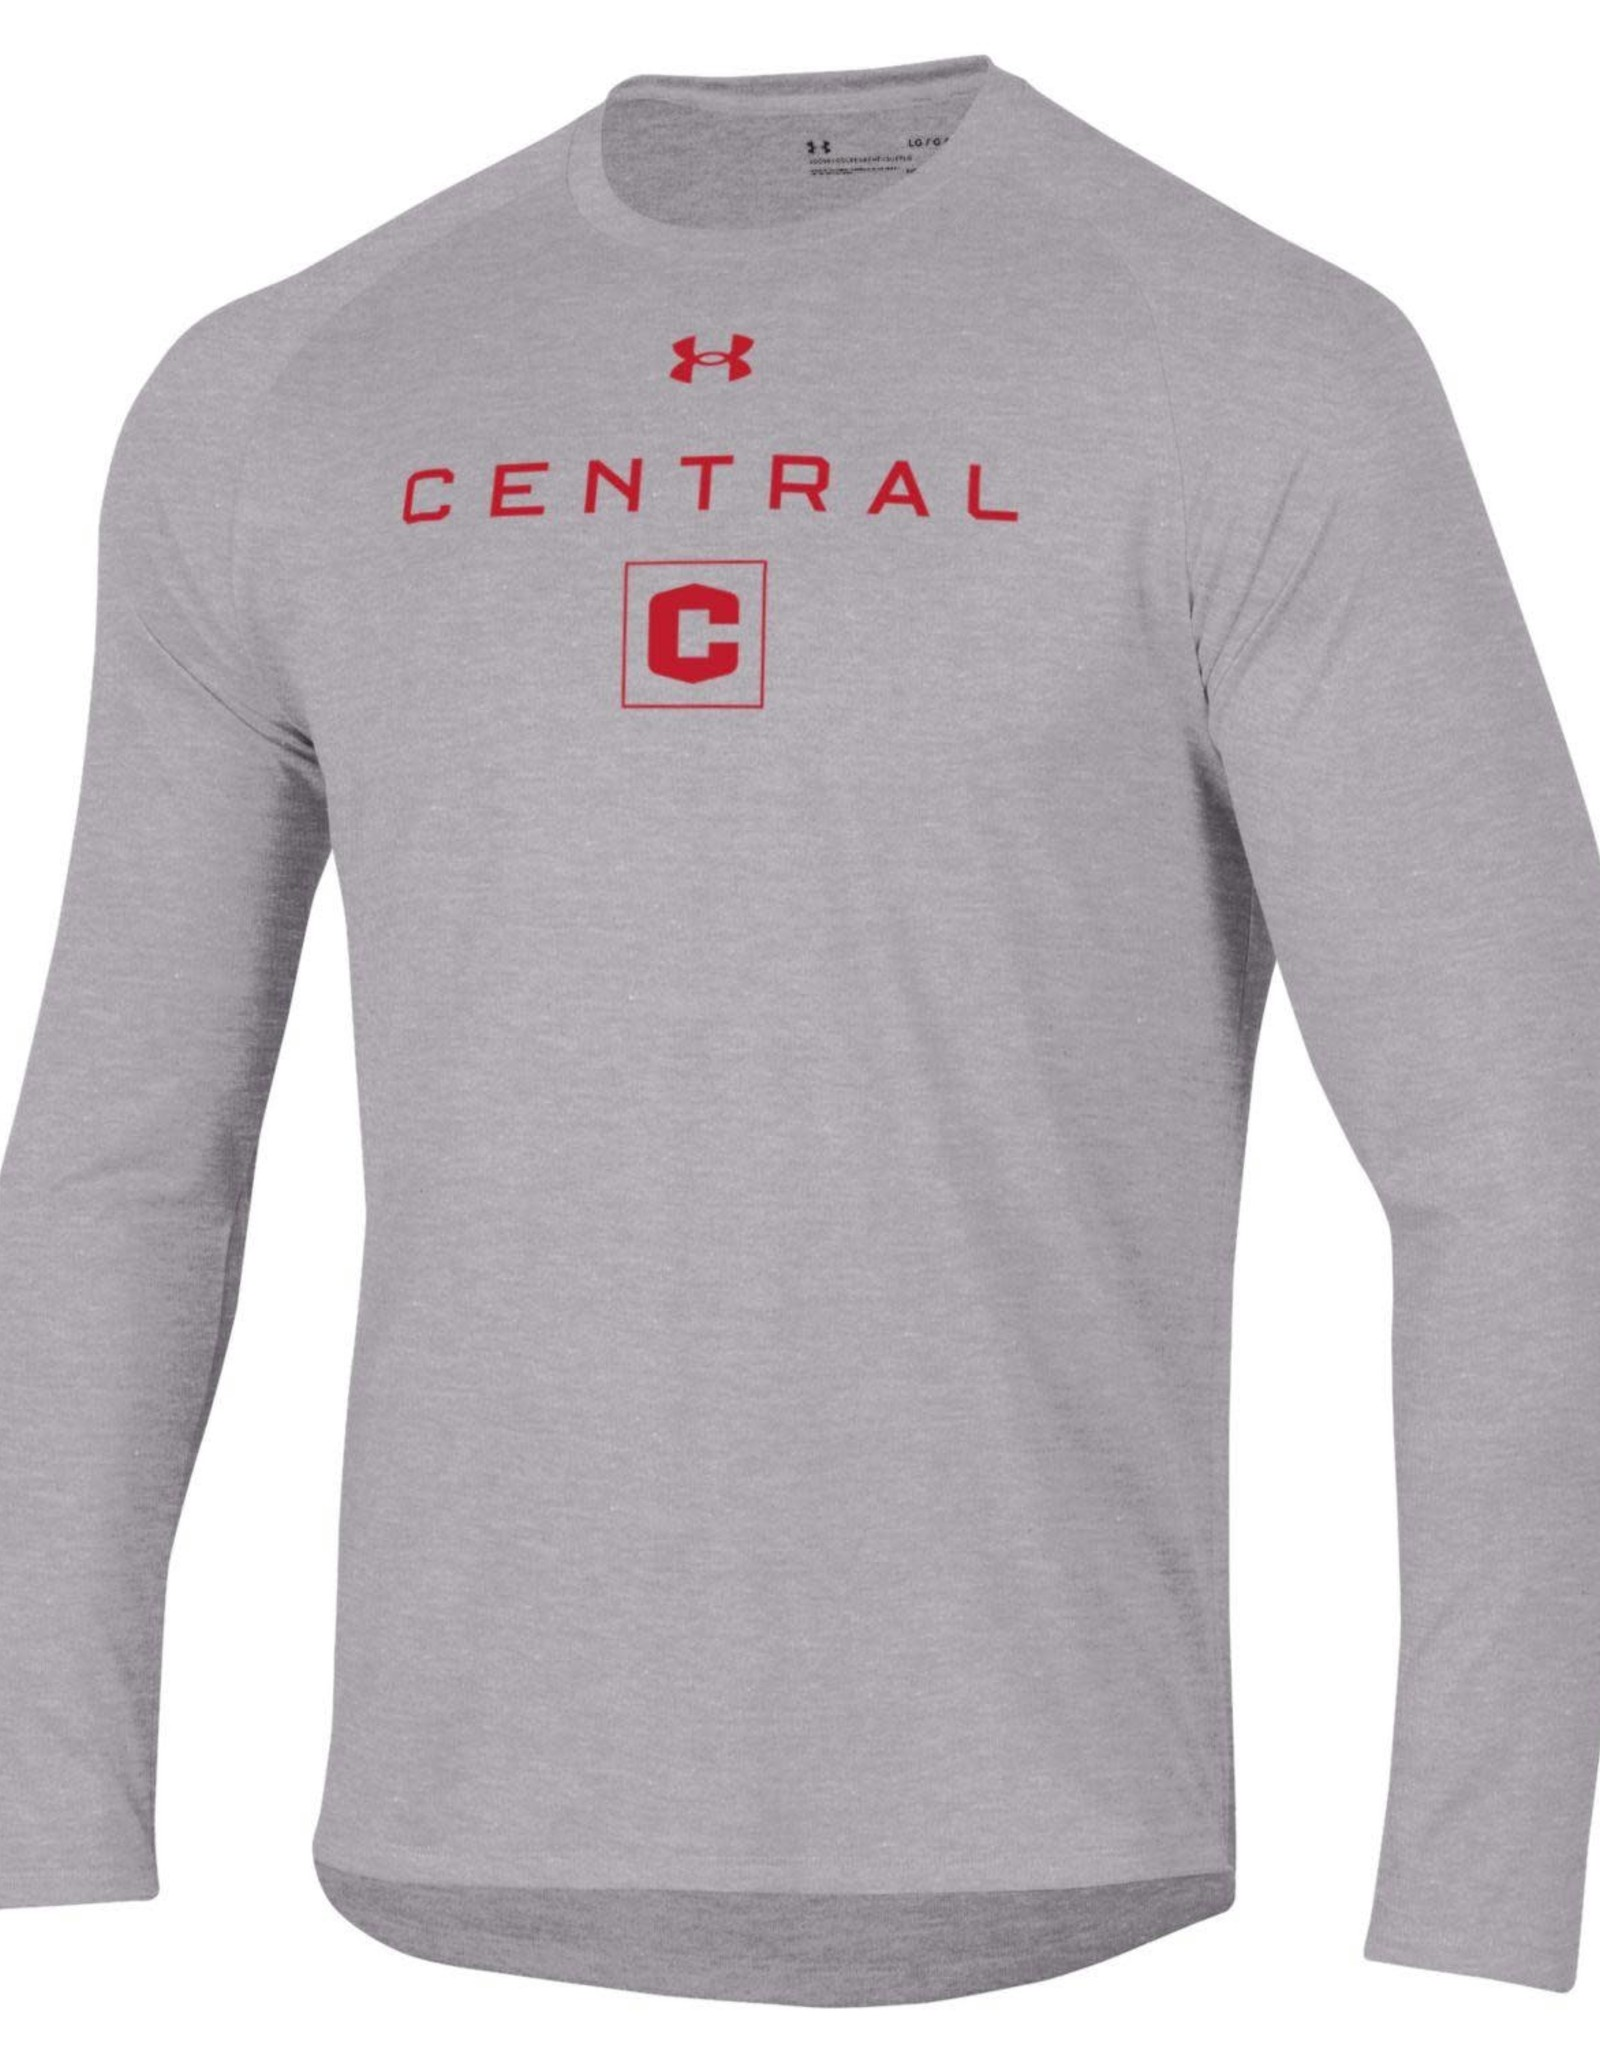 UA UA Tech Tee Central C Box LS Gray